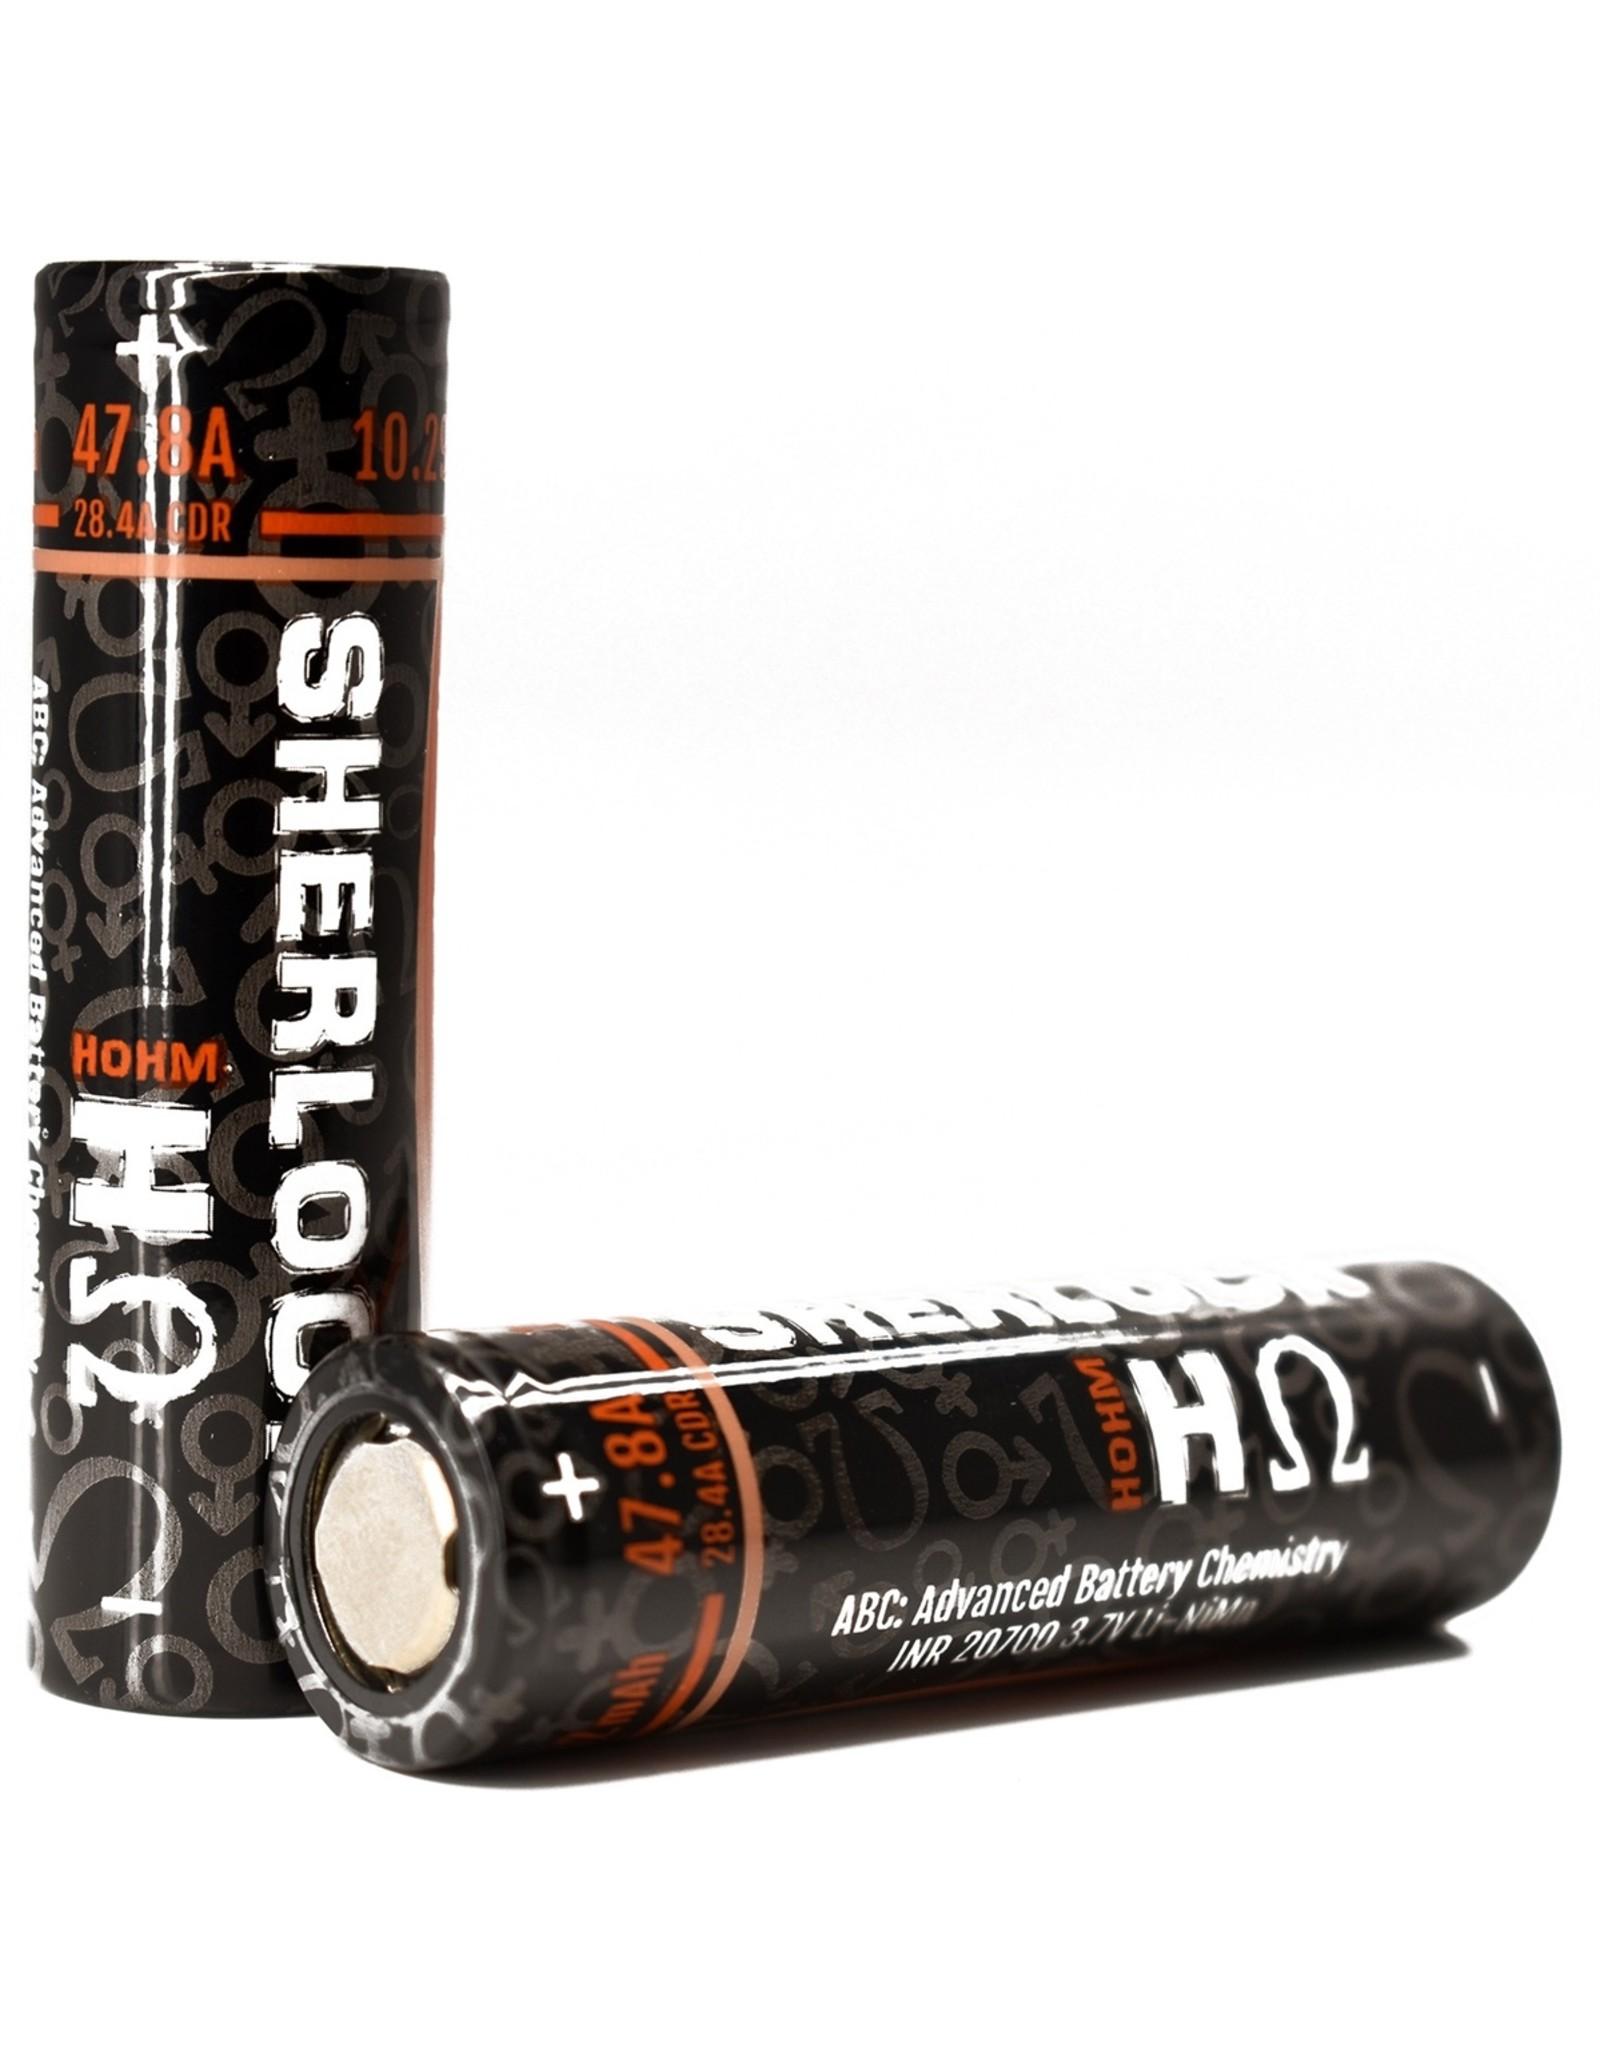 20700 Sherlock Hohm Batteries